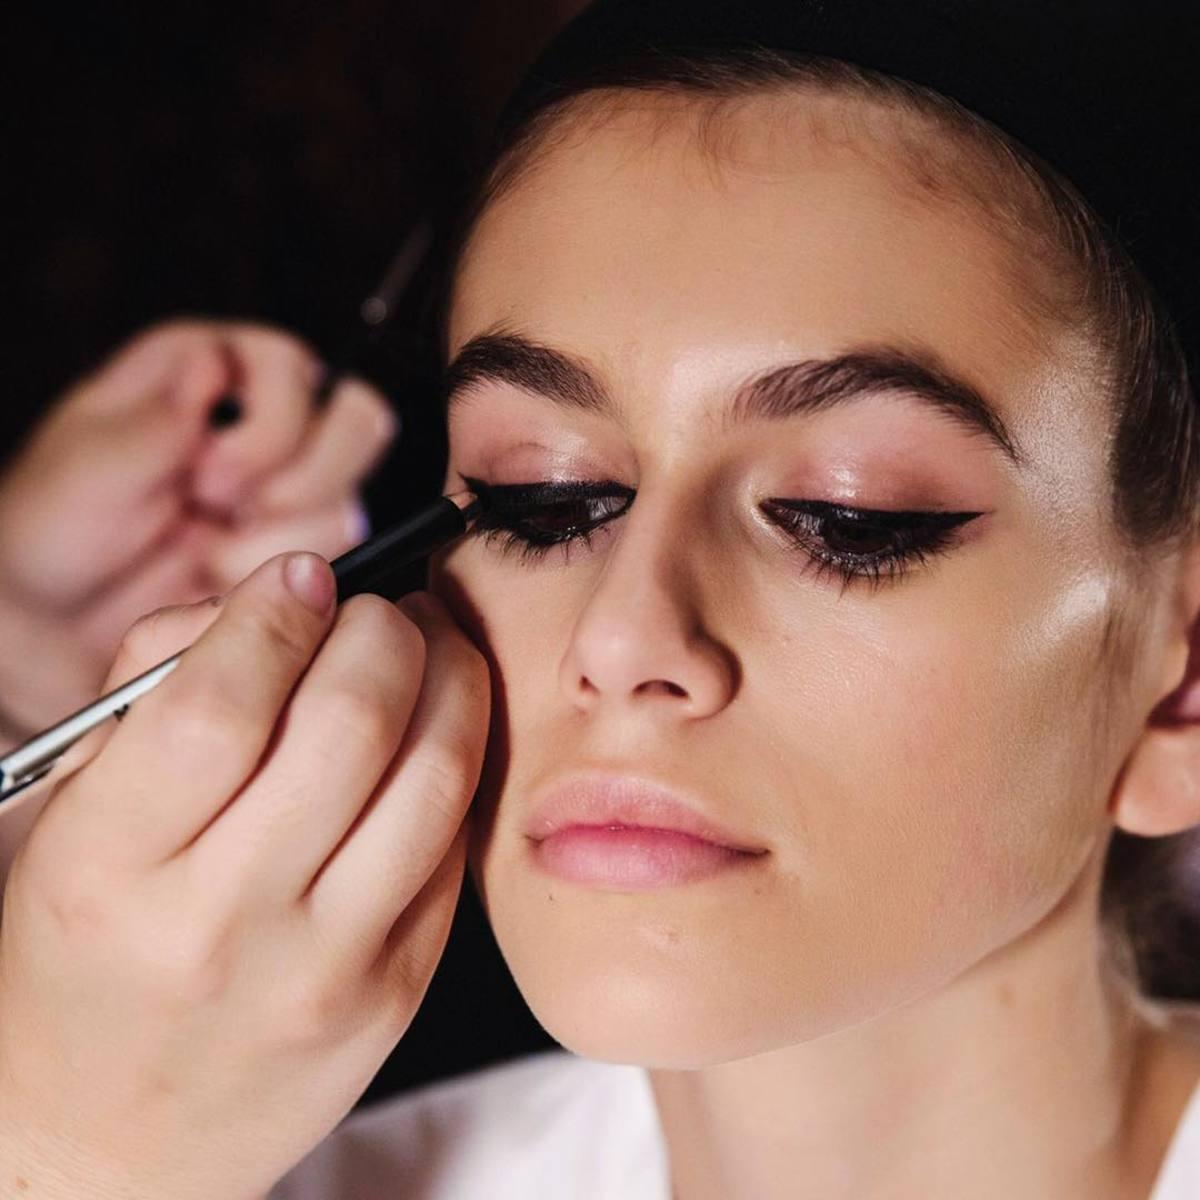 Eye makeup allergy